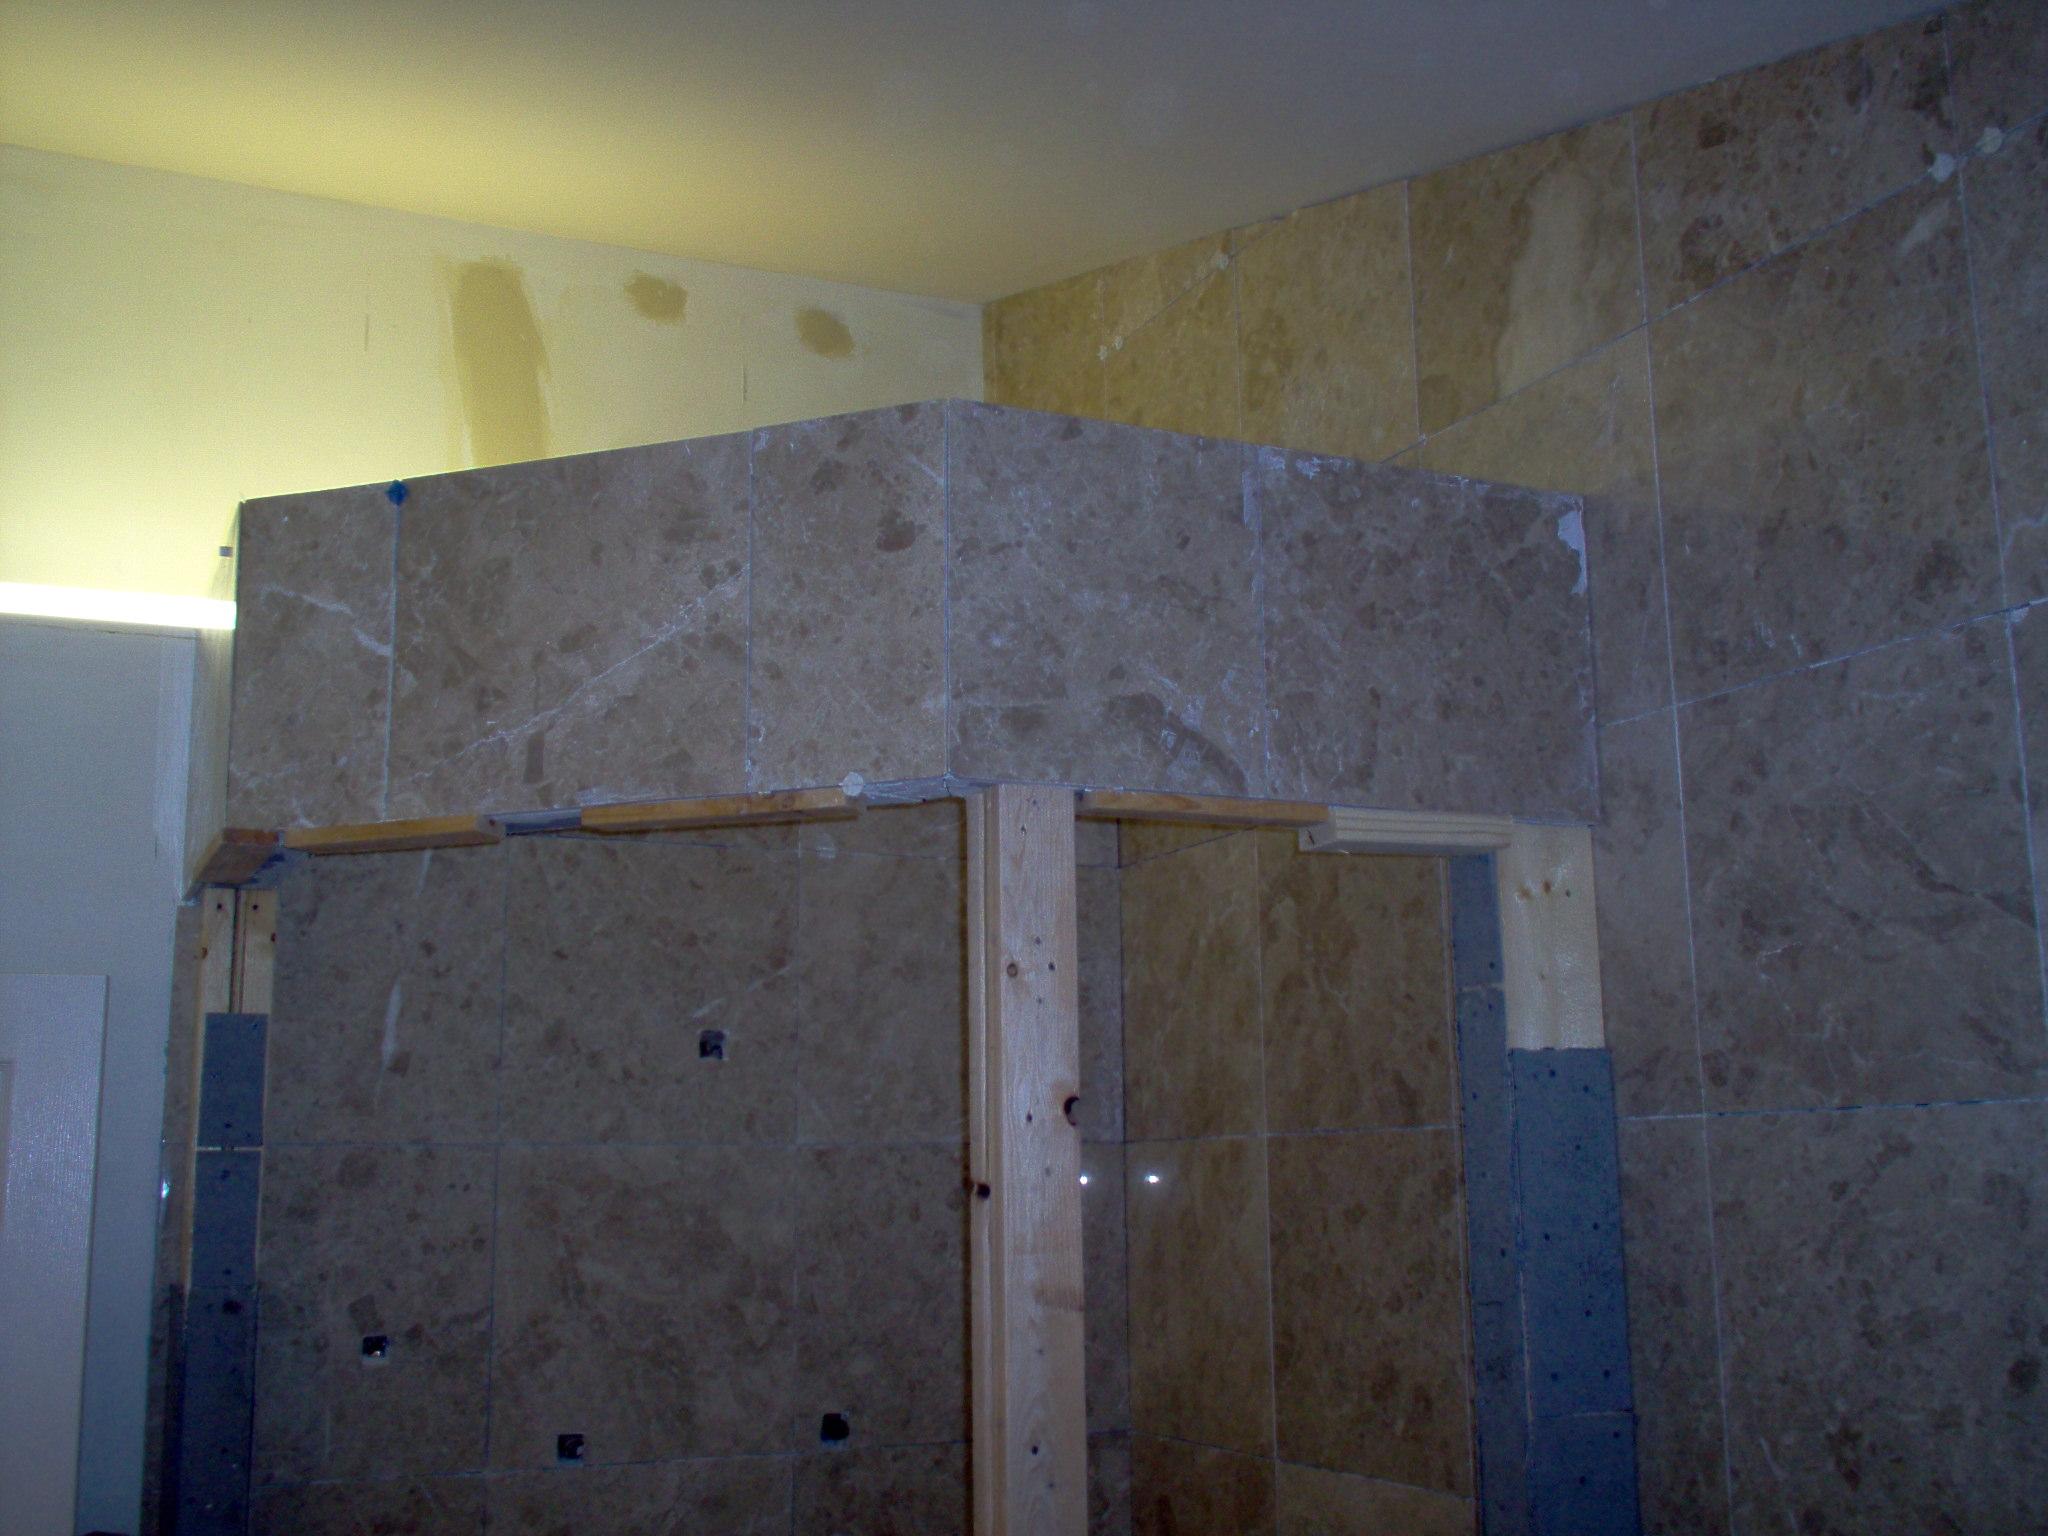 Bathroom Remodeling St Louis bath remodeling | bathtub reglazing | bathtub liners | st louis, mo